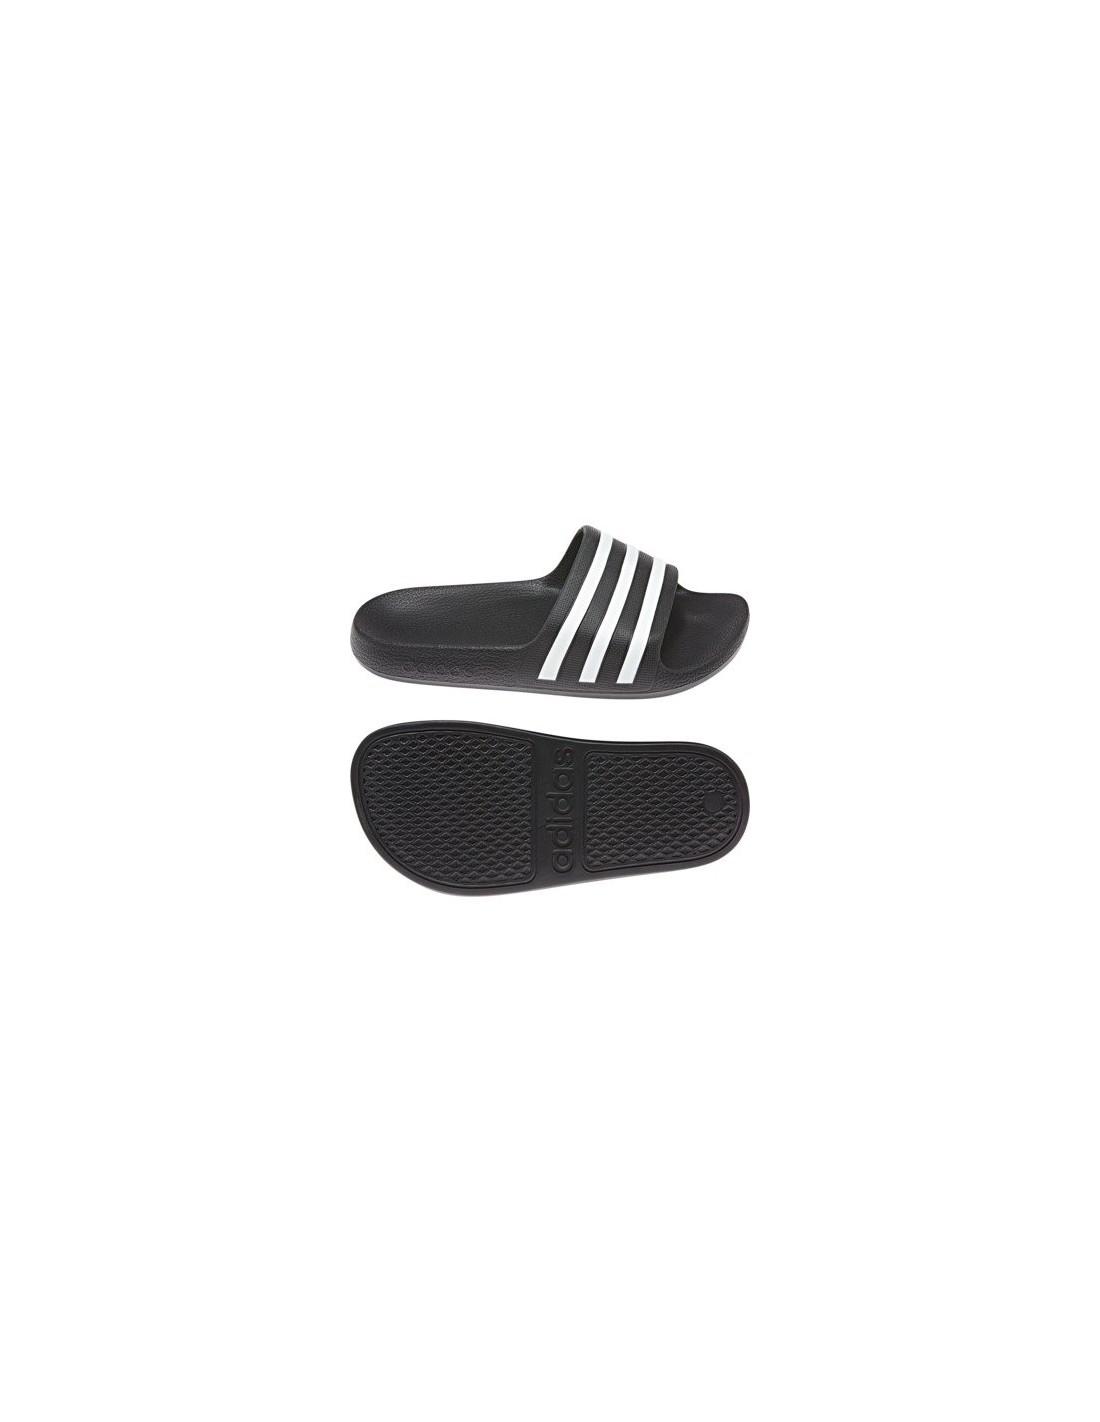 Sandaler Adidas Adilette Aqua Jr F35556 199 kr